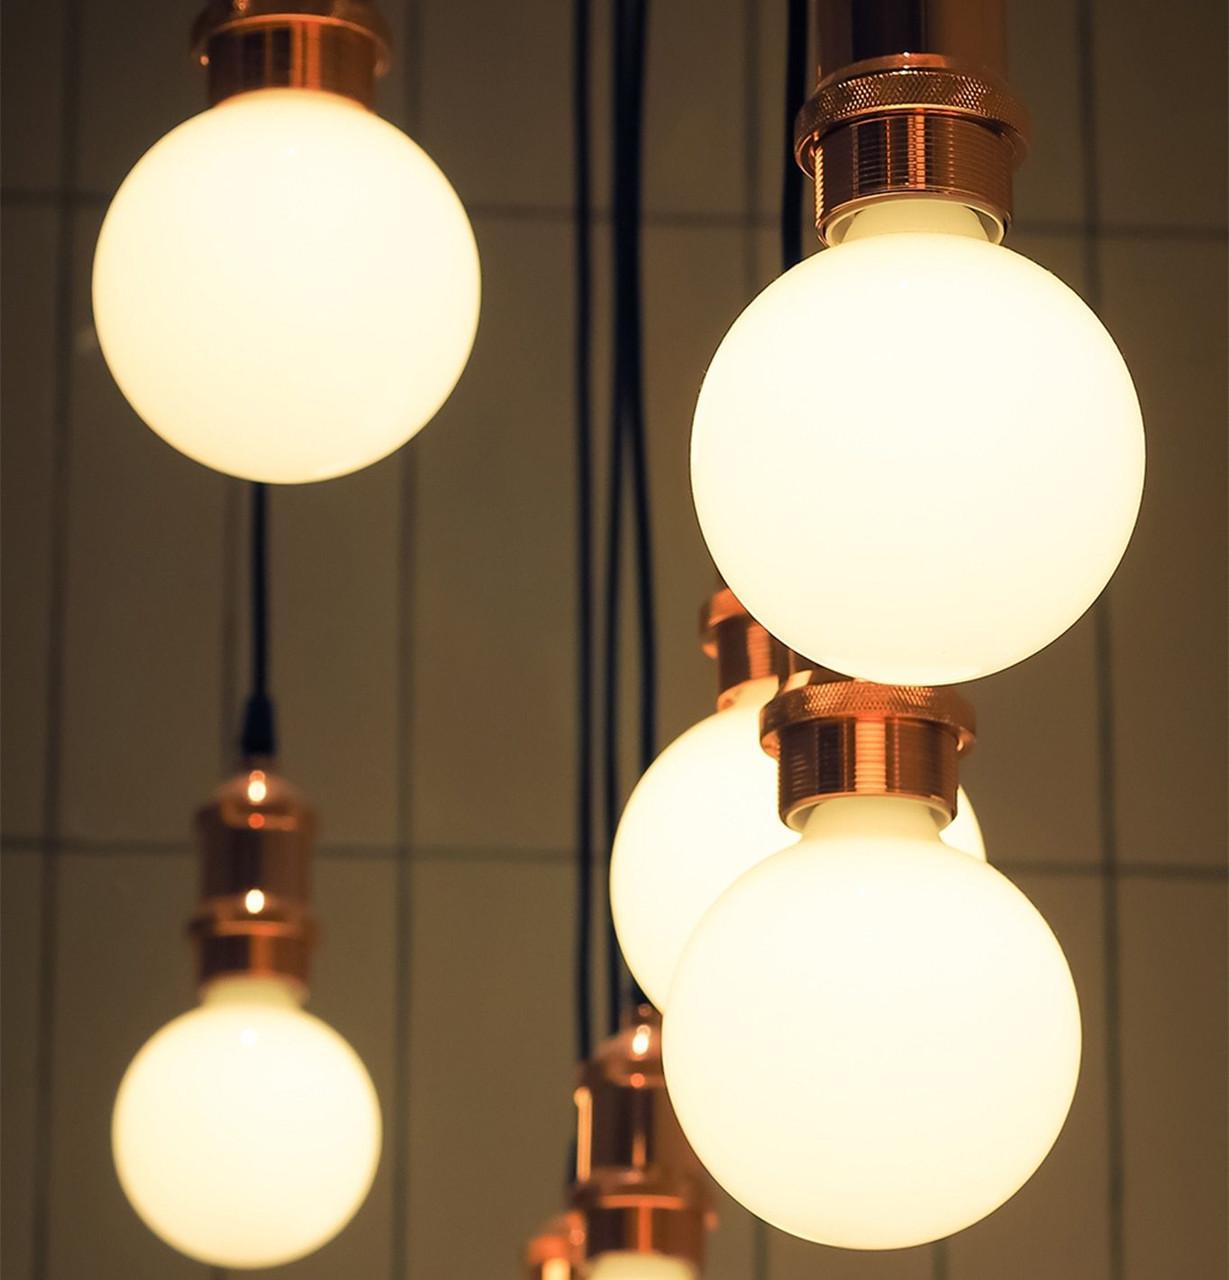 LED Dimmable G95 2700K Light Bulbs